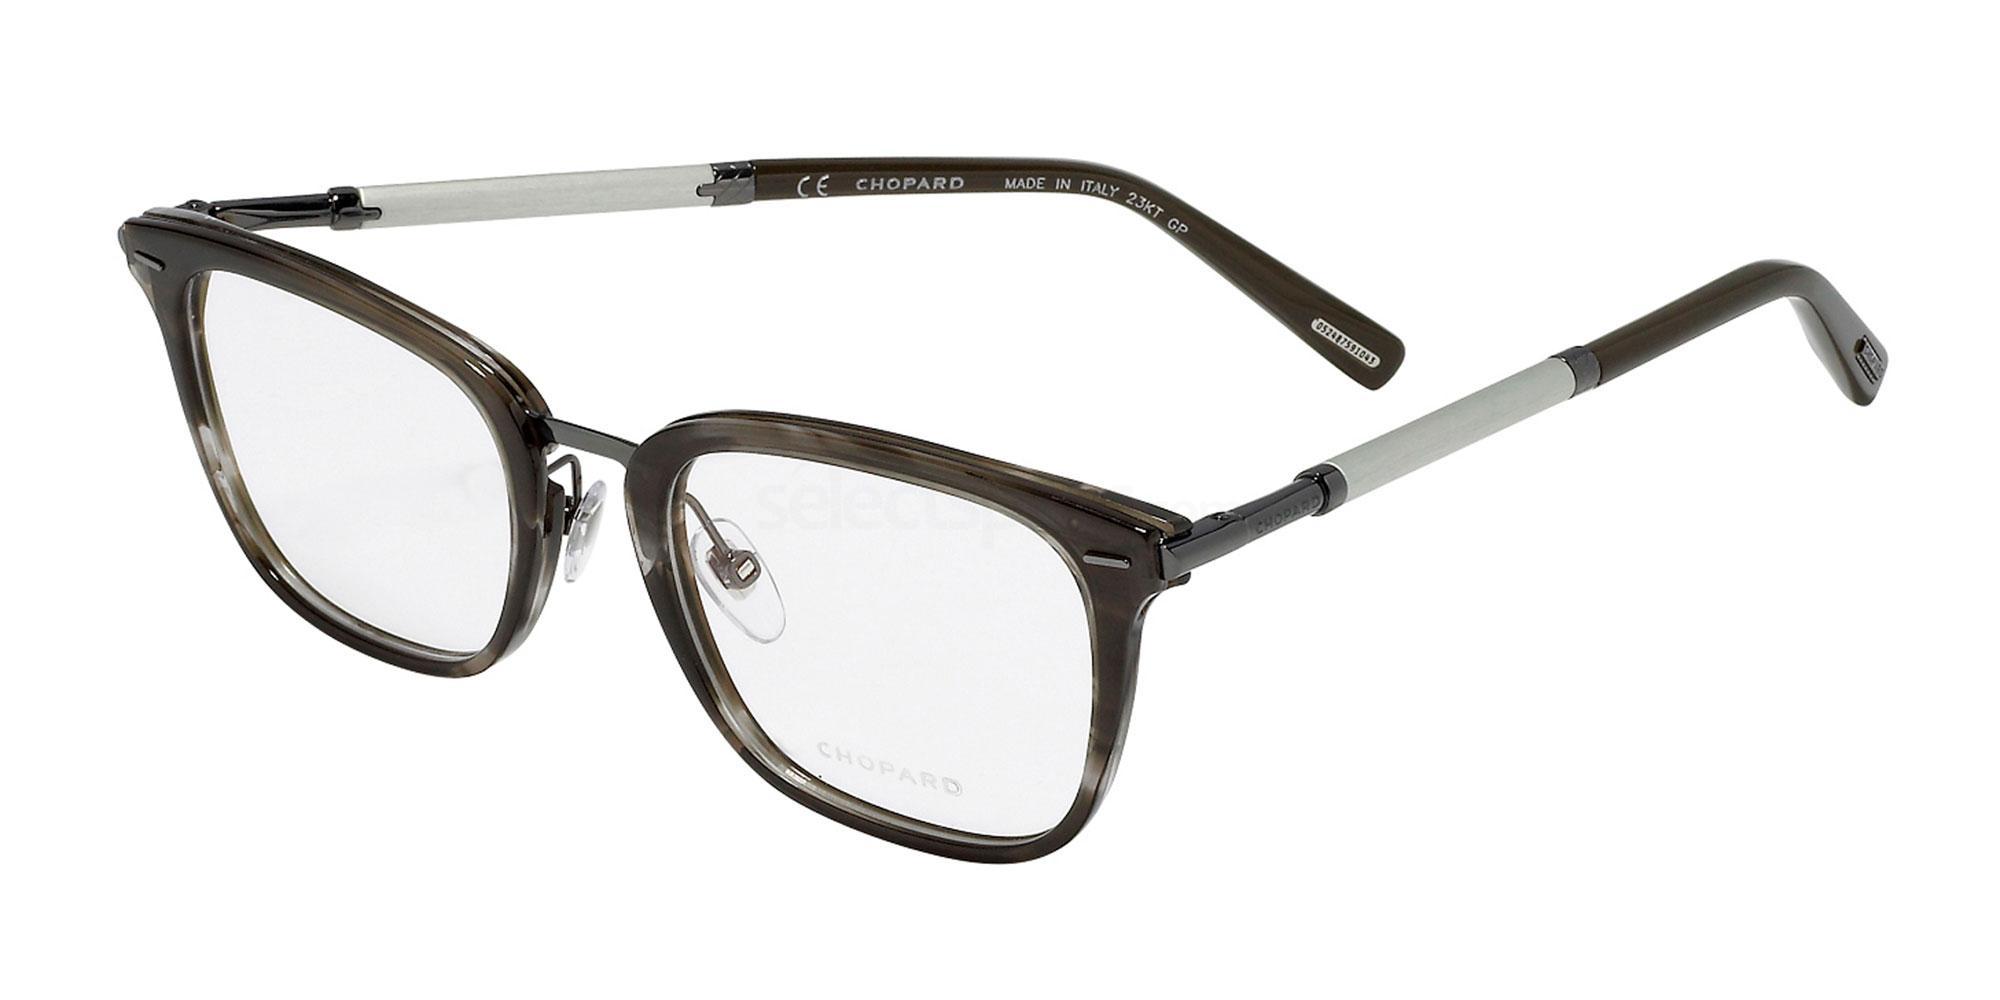 0568 VCHC76V Glasses, Chopard